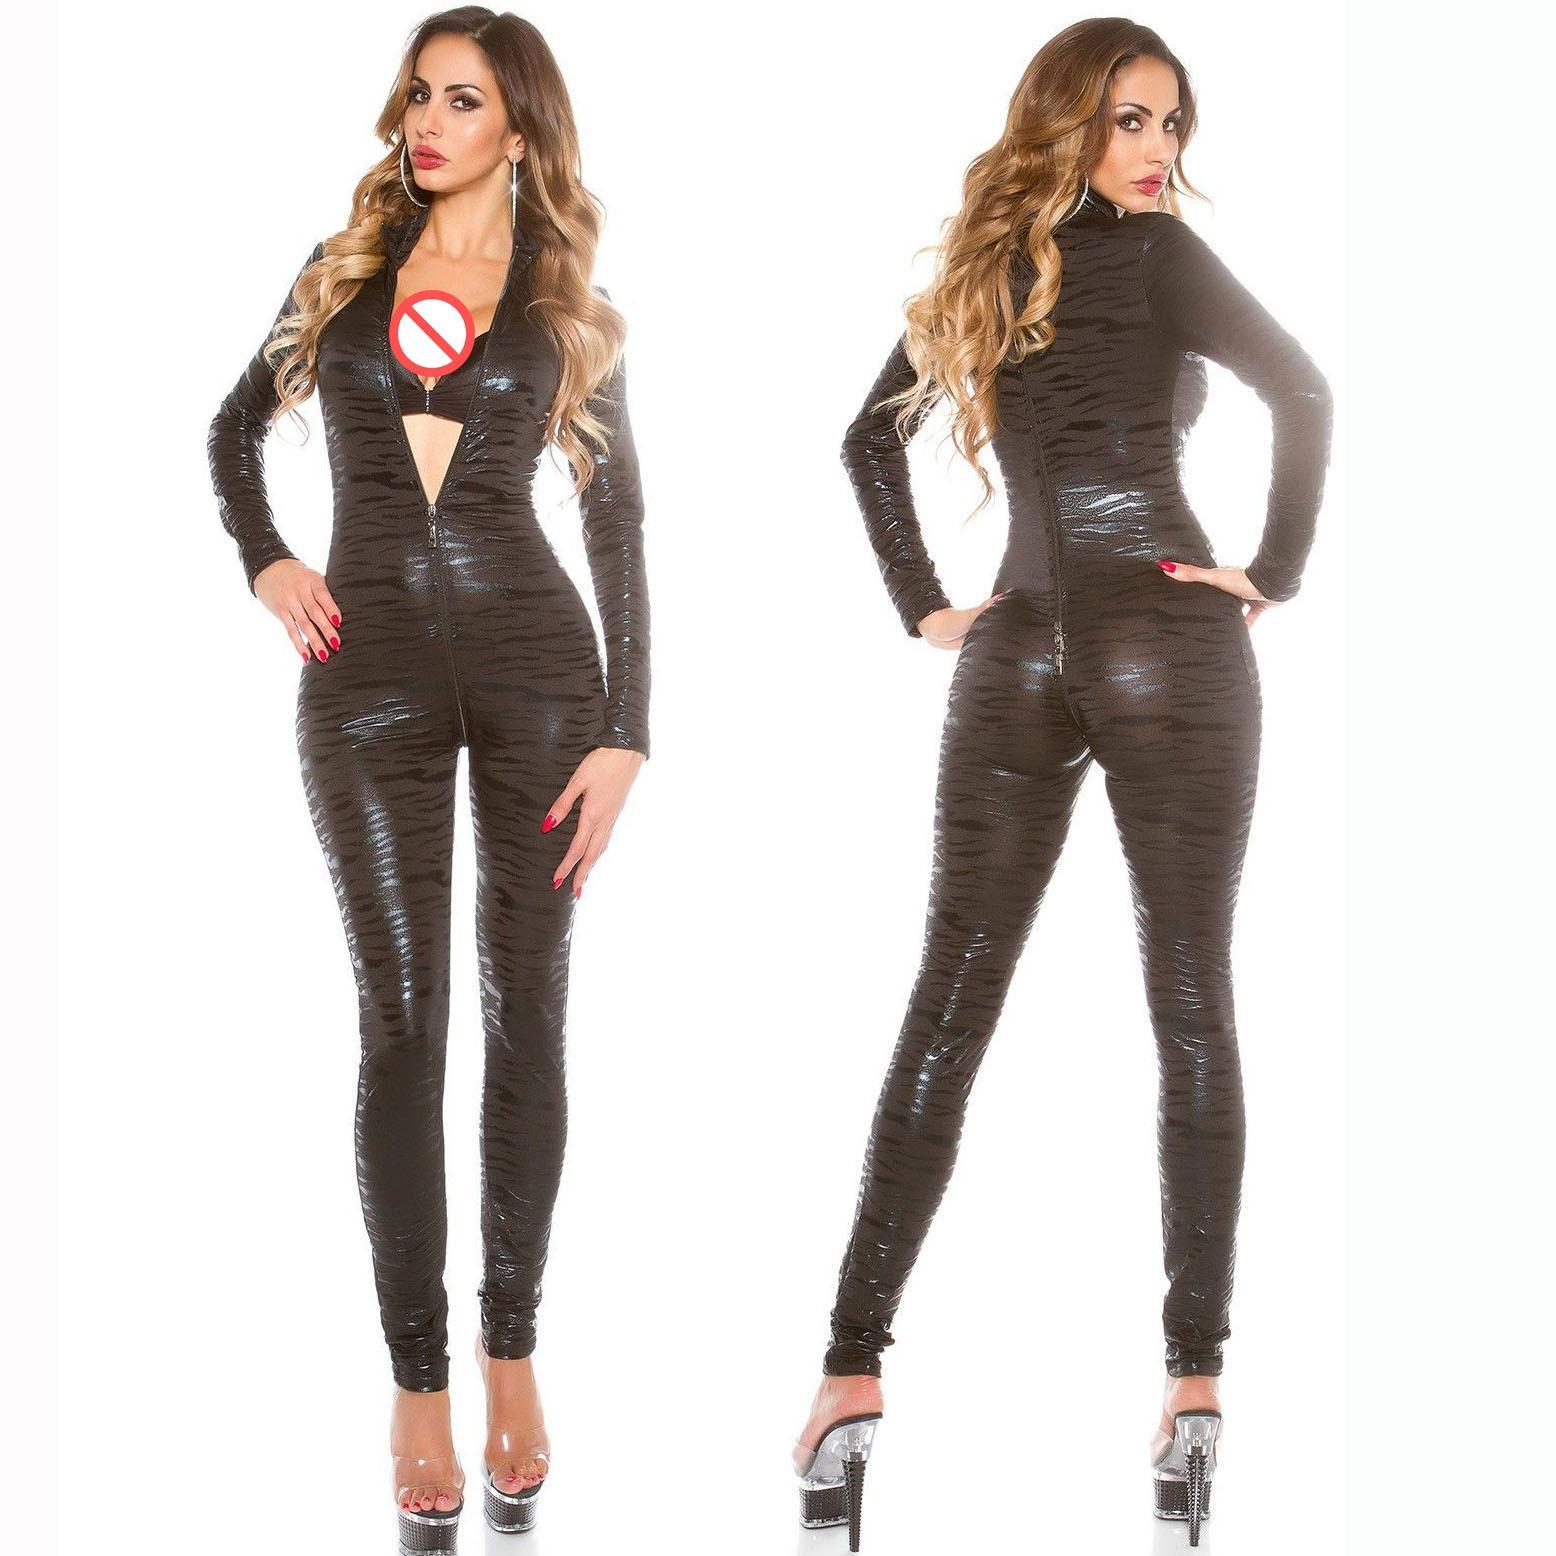 47f5753e62b 2019 European Plus Size 2XL Full Bodysuit Faux Leather Latex Bodysuit Women  Wetlook Sexy Lingerie Leotard Costumes For Women From Jessicazeng